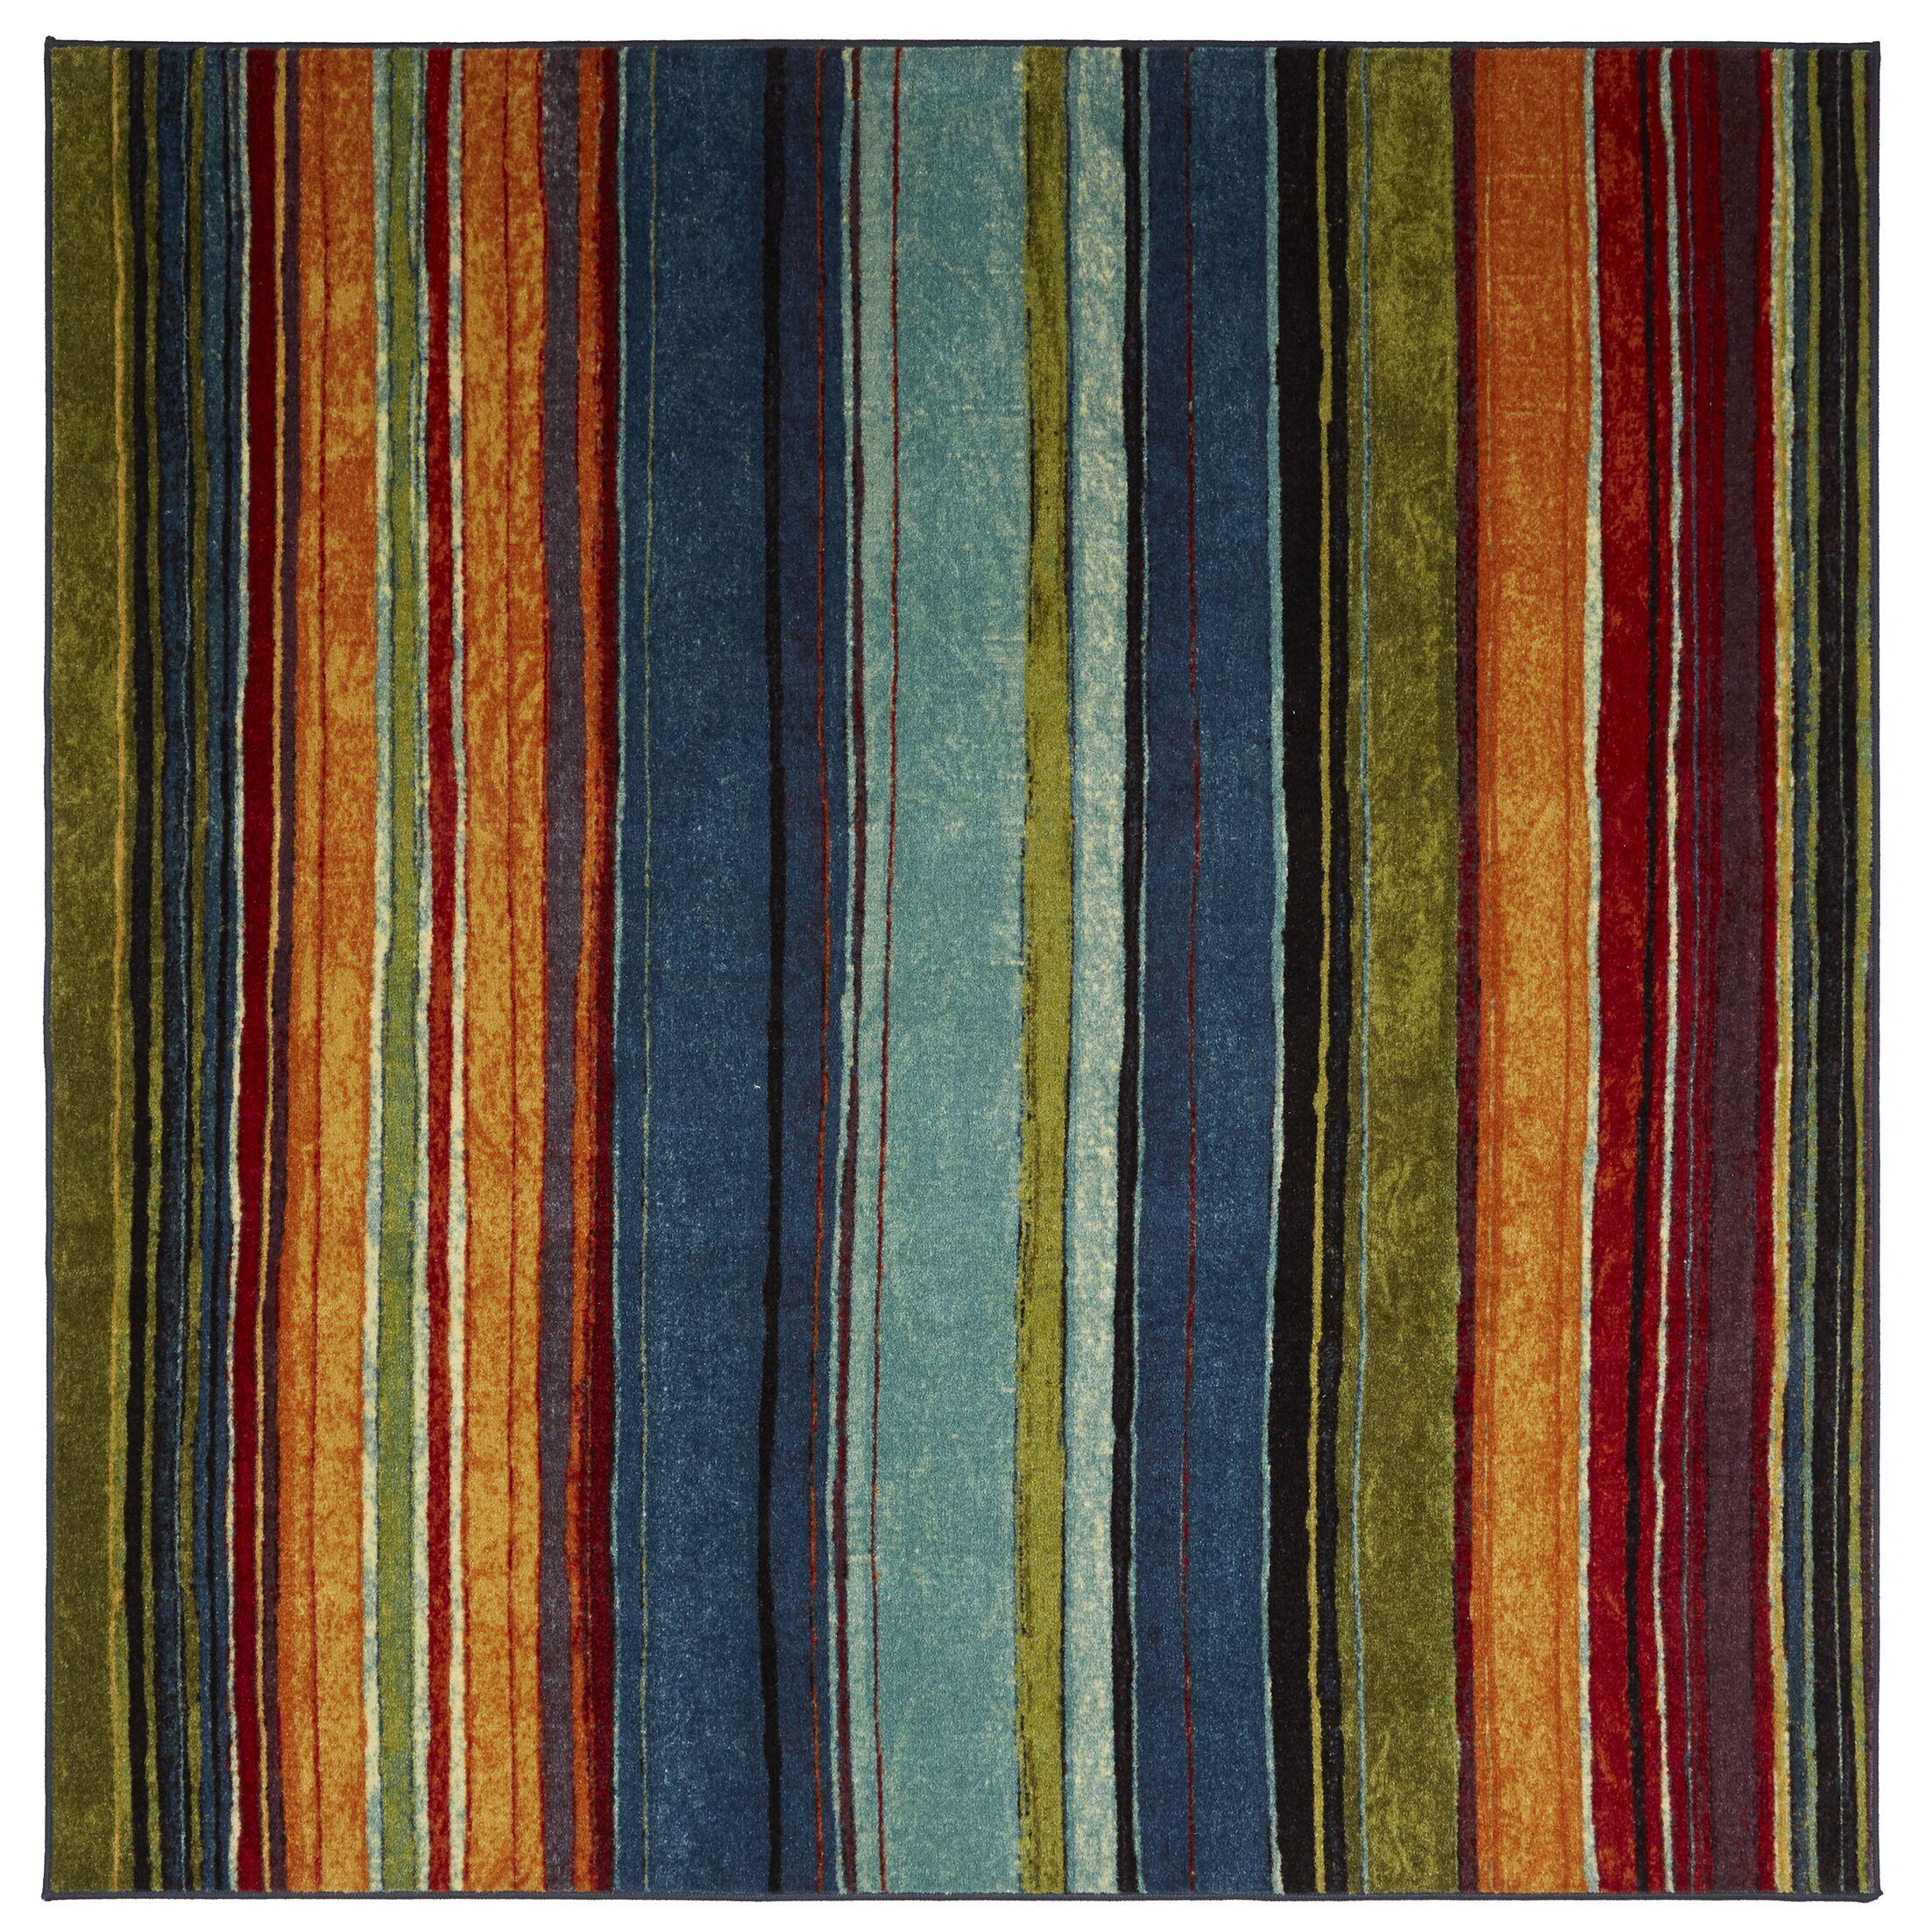 Bartlett Las Cazuela Blue/Orange Area Rug Rug Size: Rectangle 10'x14'